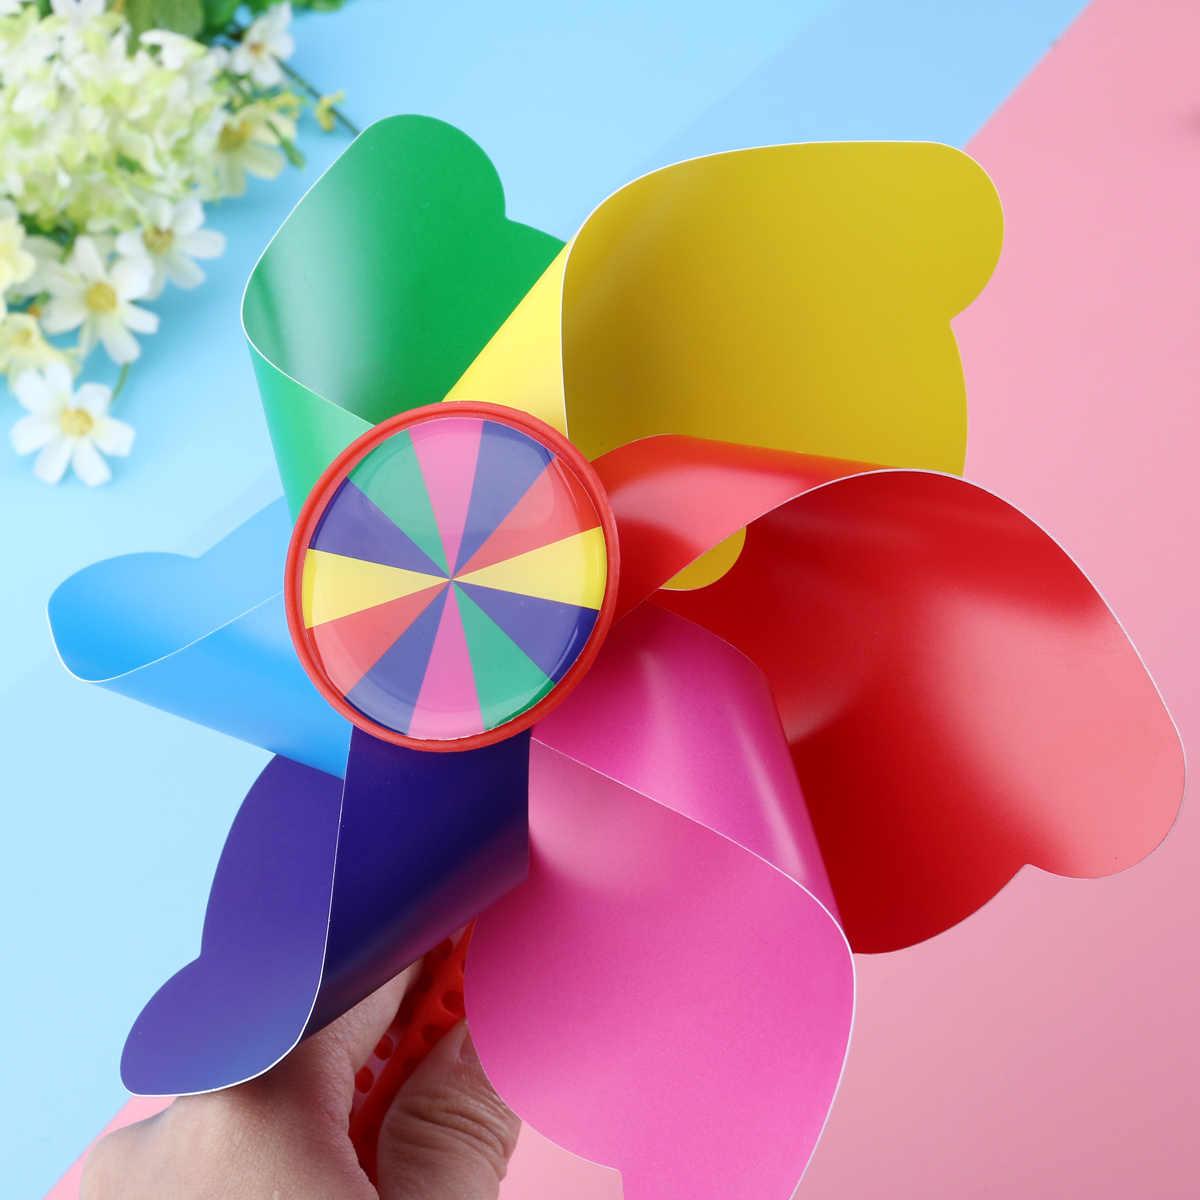 1 Pcs Anak Sepeda Bunga Pinwheel Kincir Angin Dekorasi Hadiah untuk Anak-anak Sepeda Skuter Kincir Angin Mainan (Rainbow Warna)